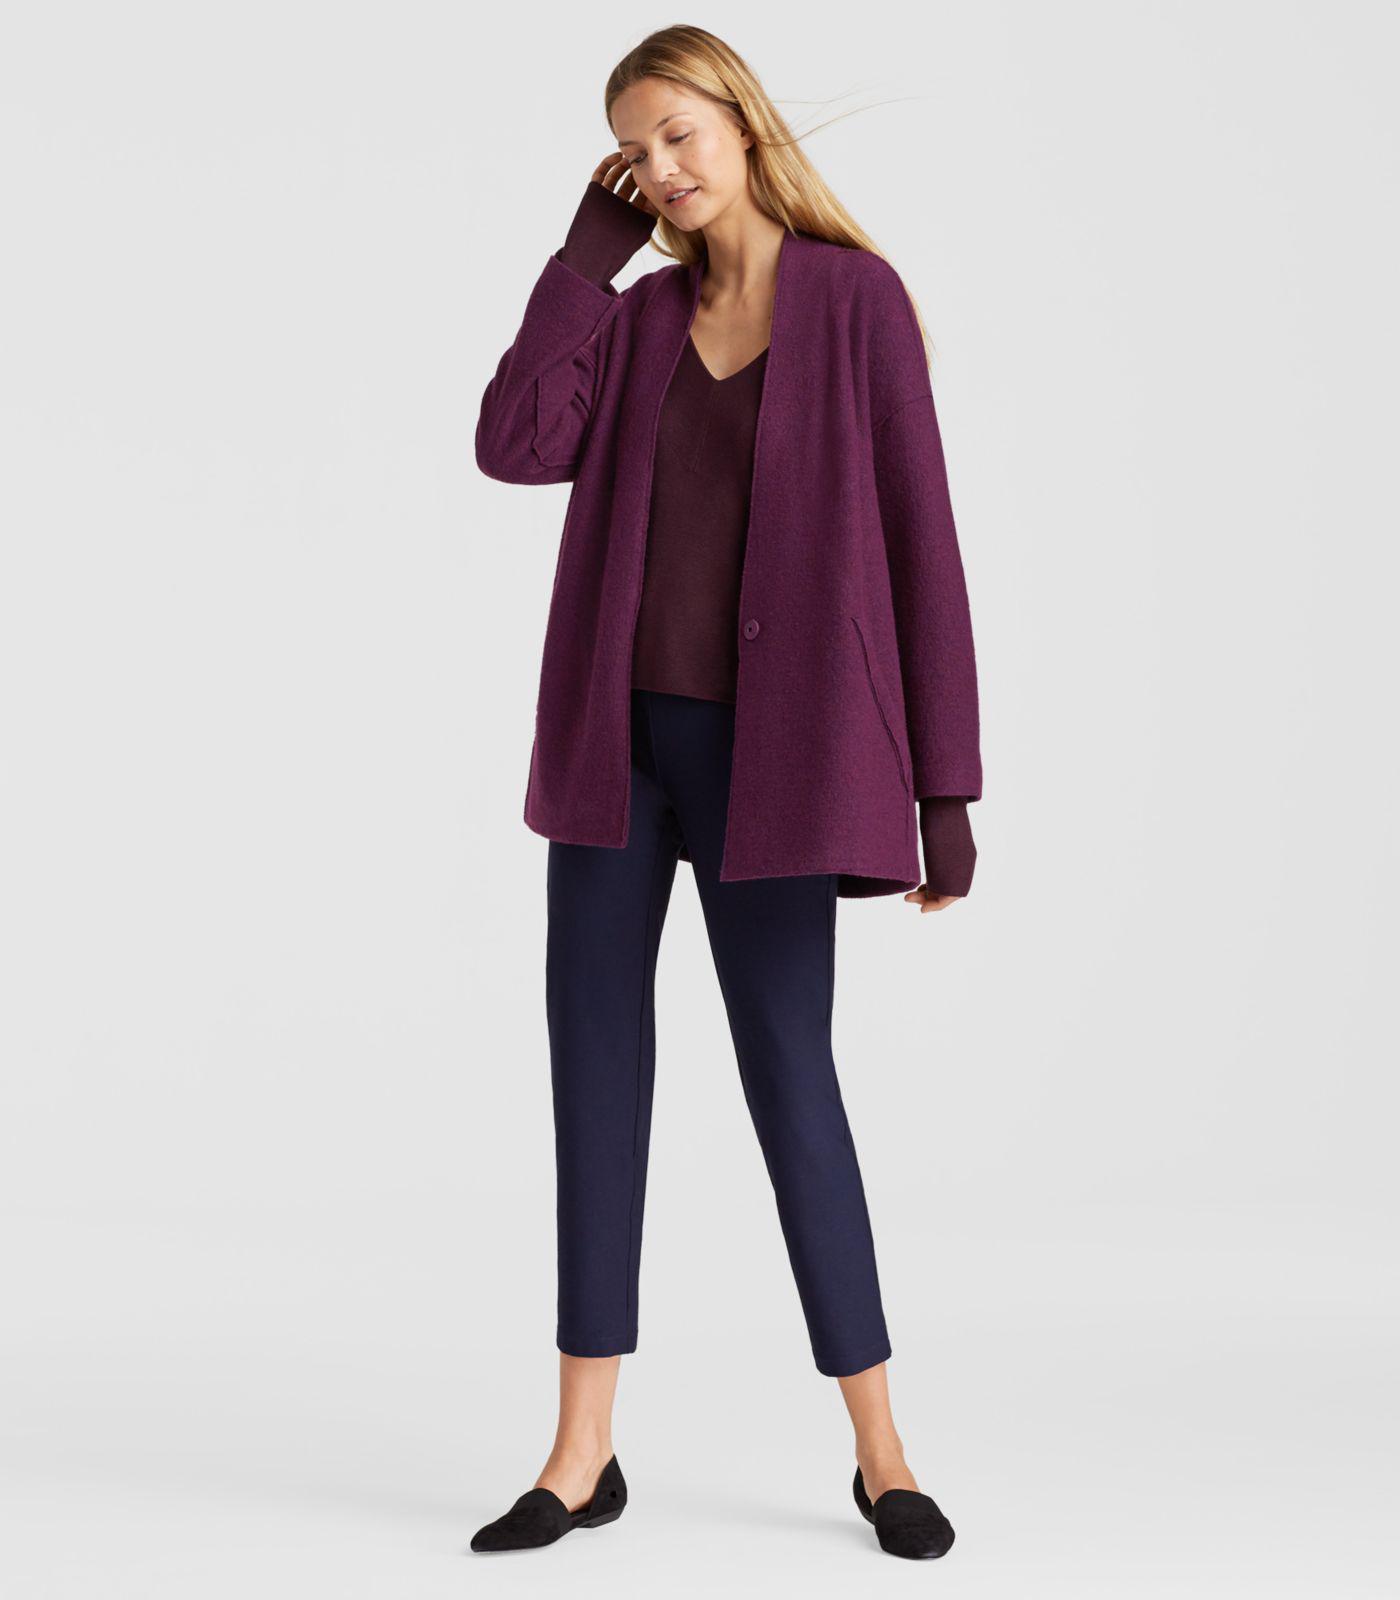 Eileen Fisher Raisonette Lightweight Boiled Wool Kimono Jacket